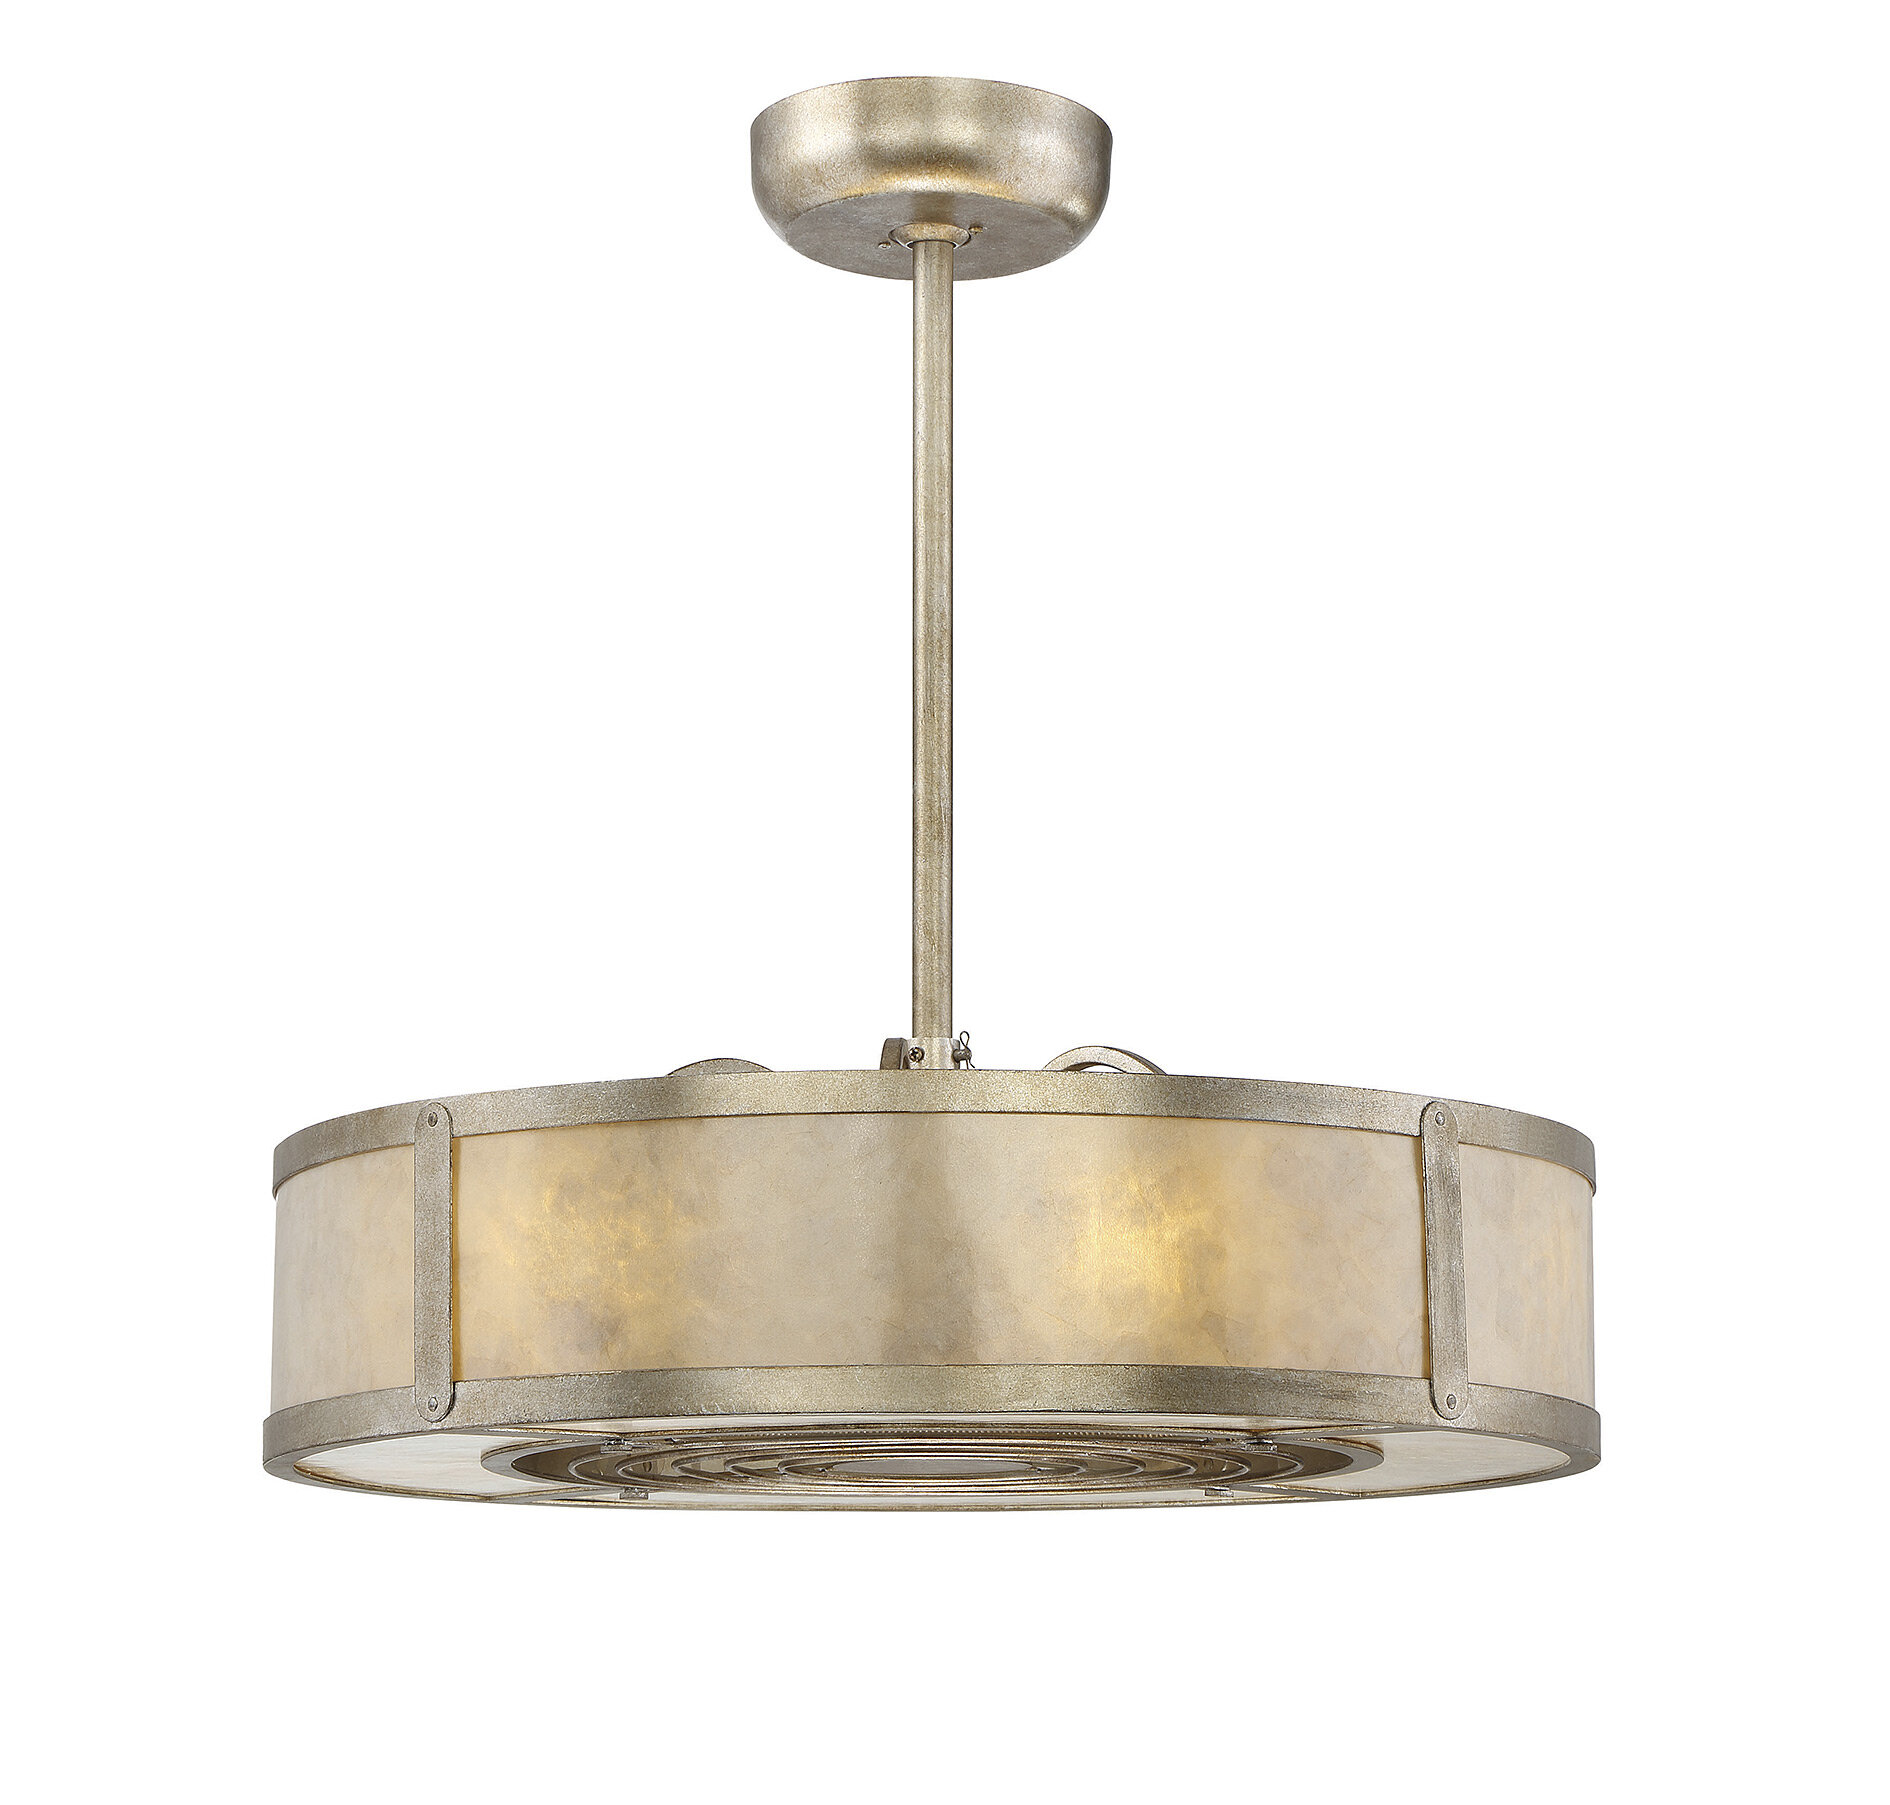 17 Stories 26 Ellzey Air Ionizing Ceiling Fan D Lier With Remote Reviews Wayfair